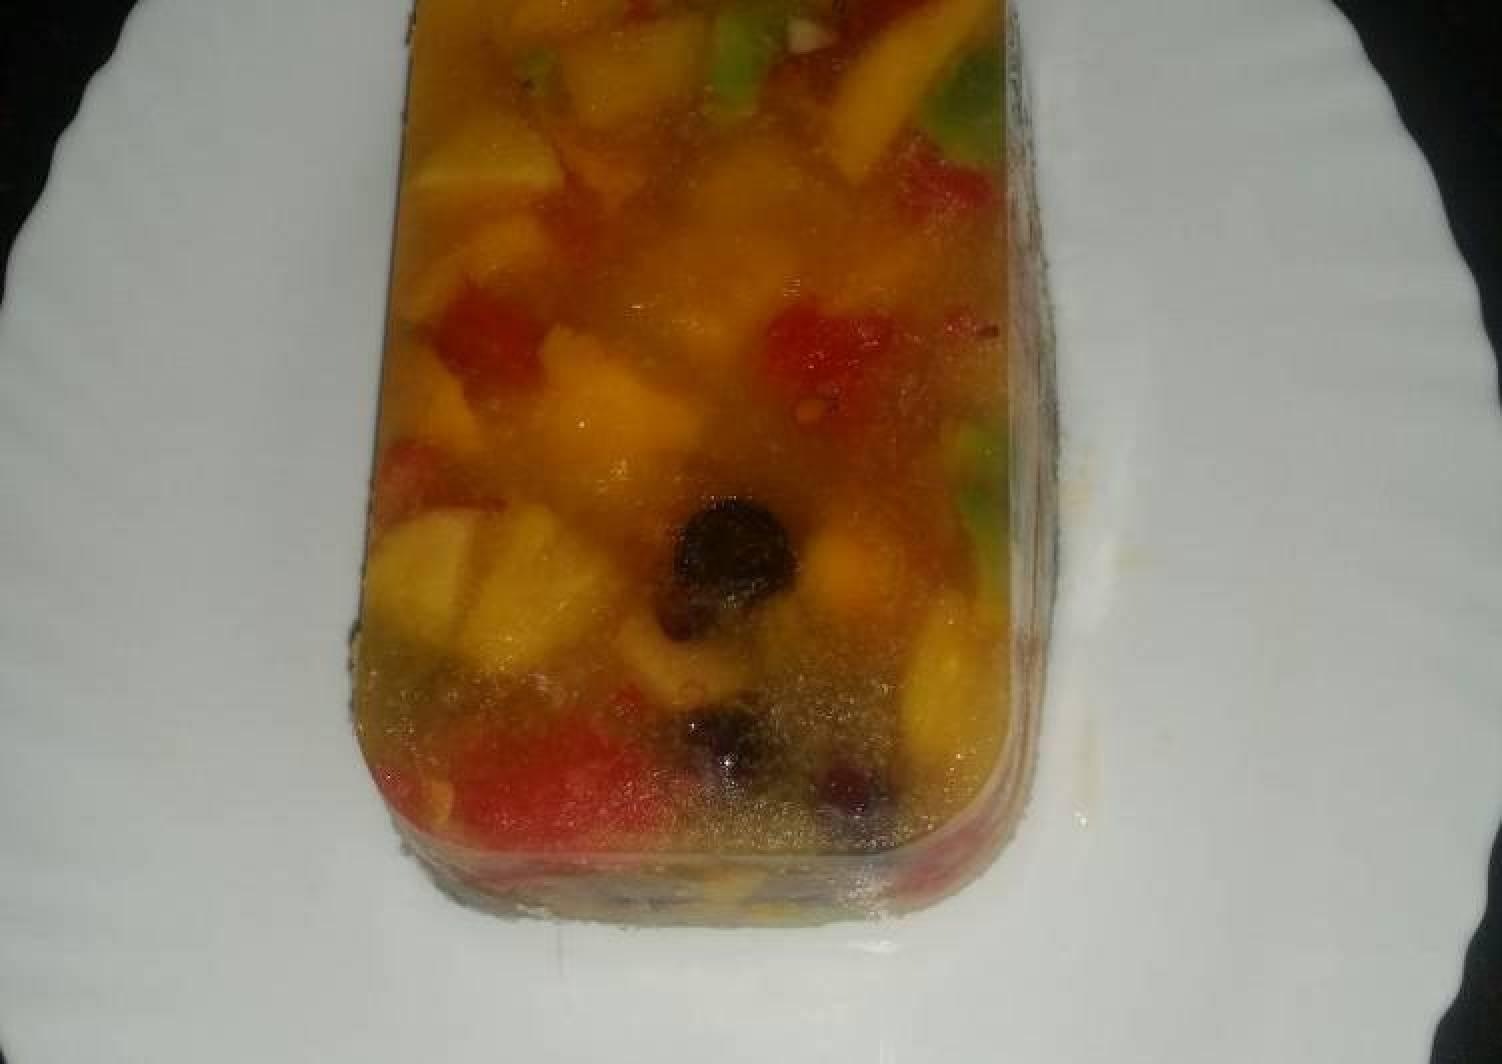 Water Melon Jello Fruit Salad #AuthorMarathon